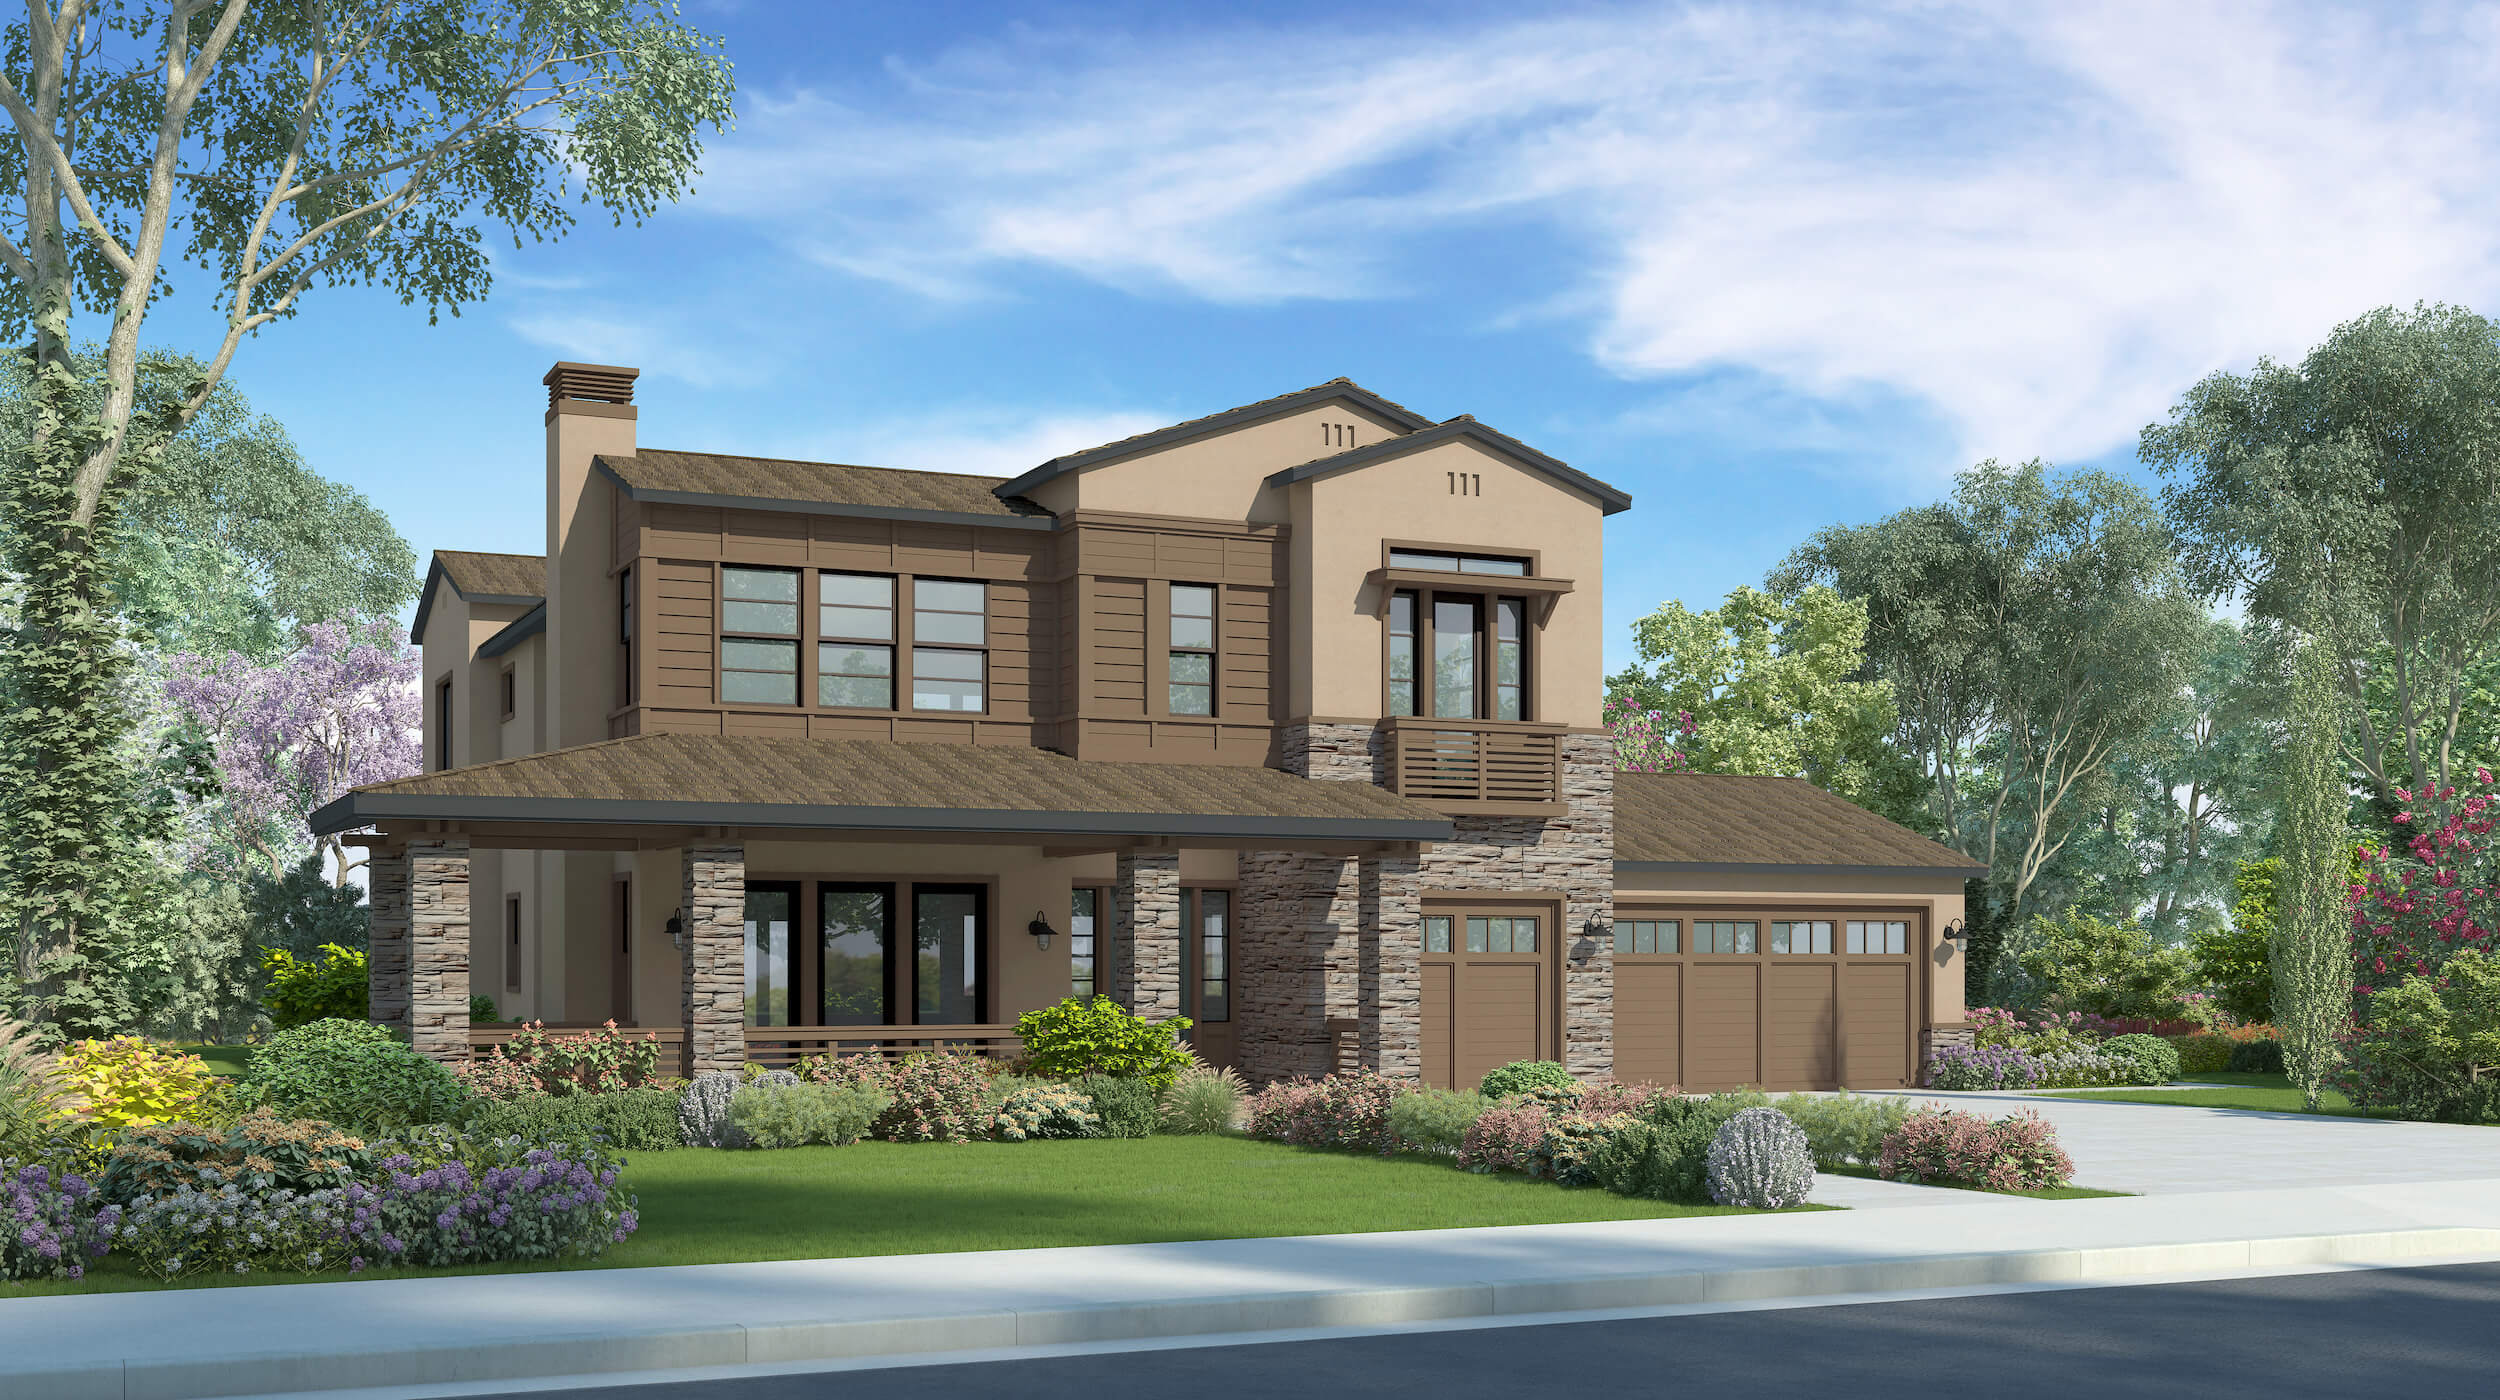 Plan 2A - California Ranch - 4,047 sf